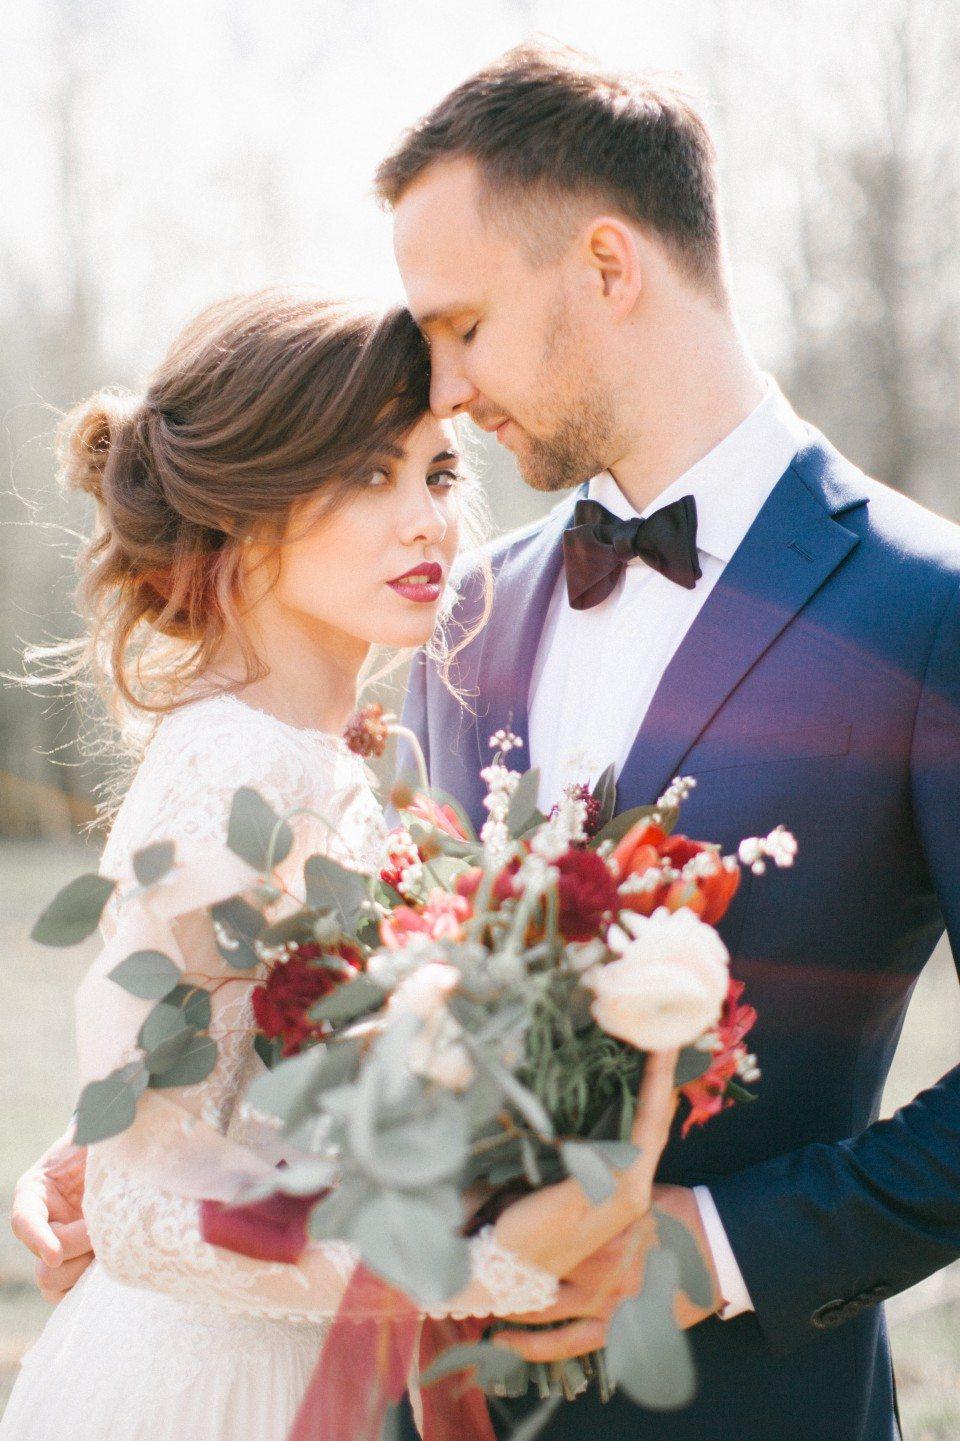 Lama wedding: стилизованная съемка